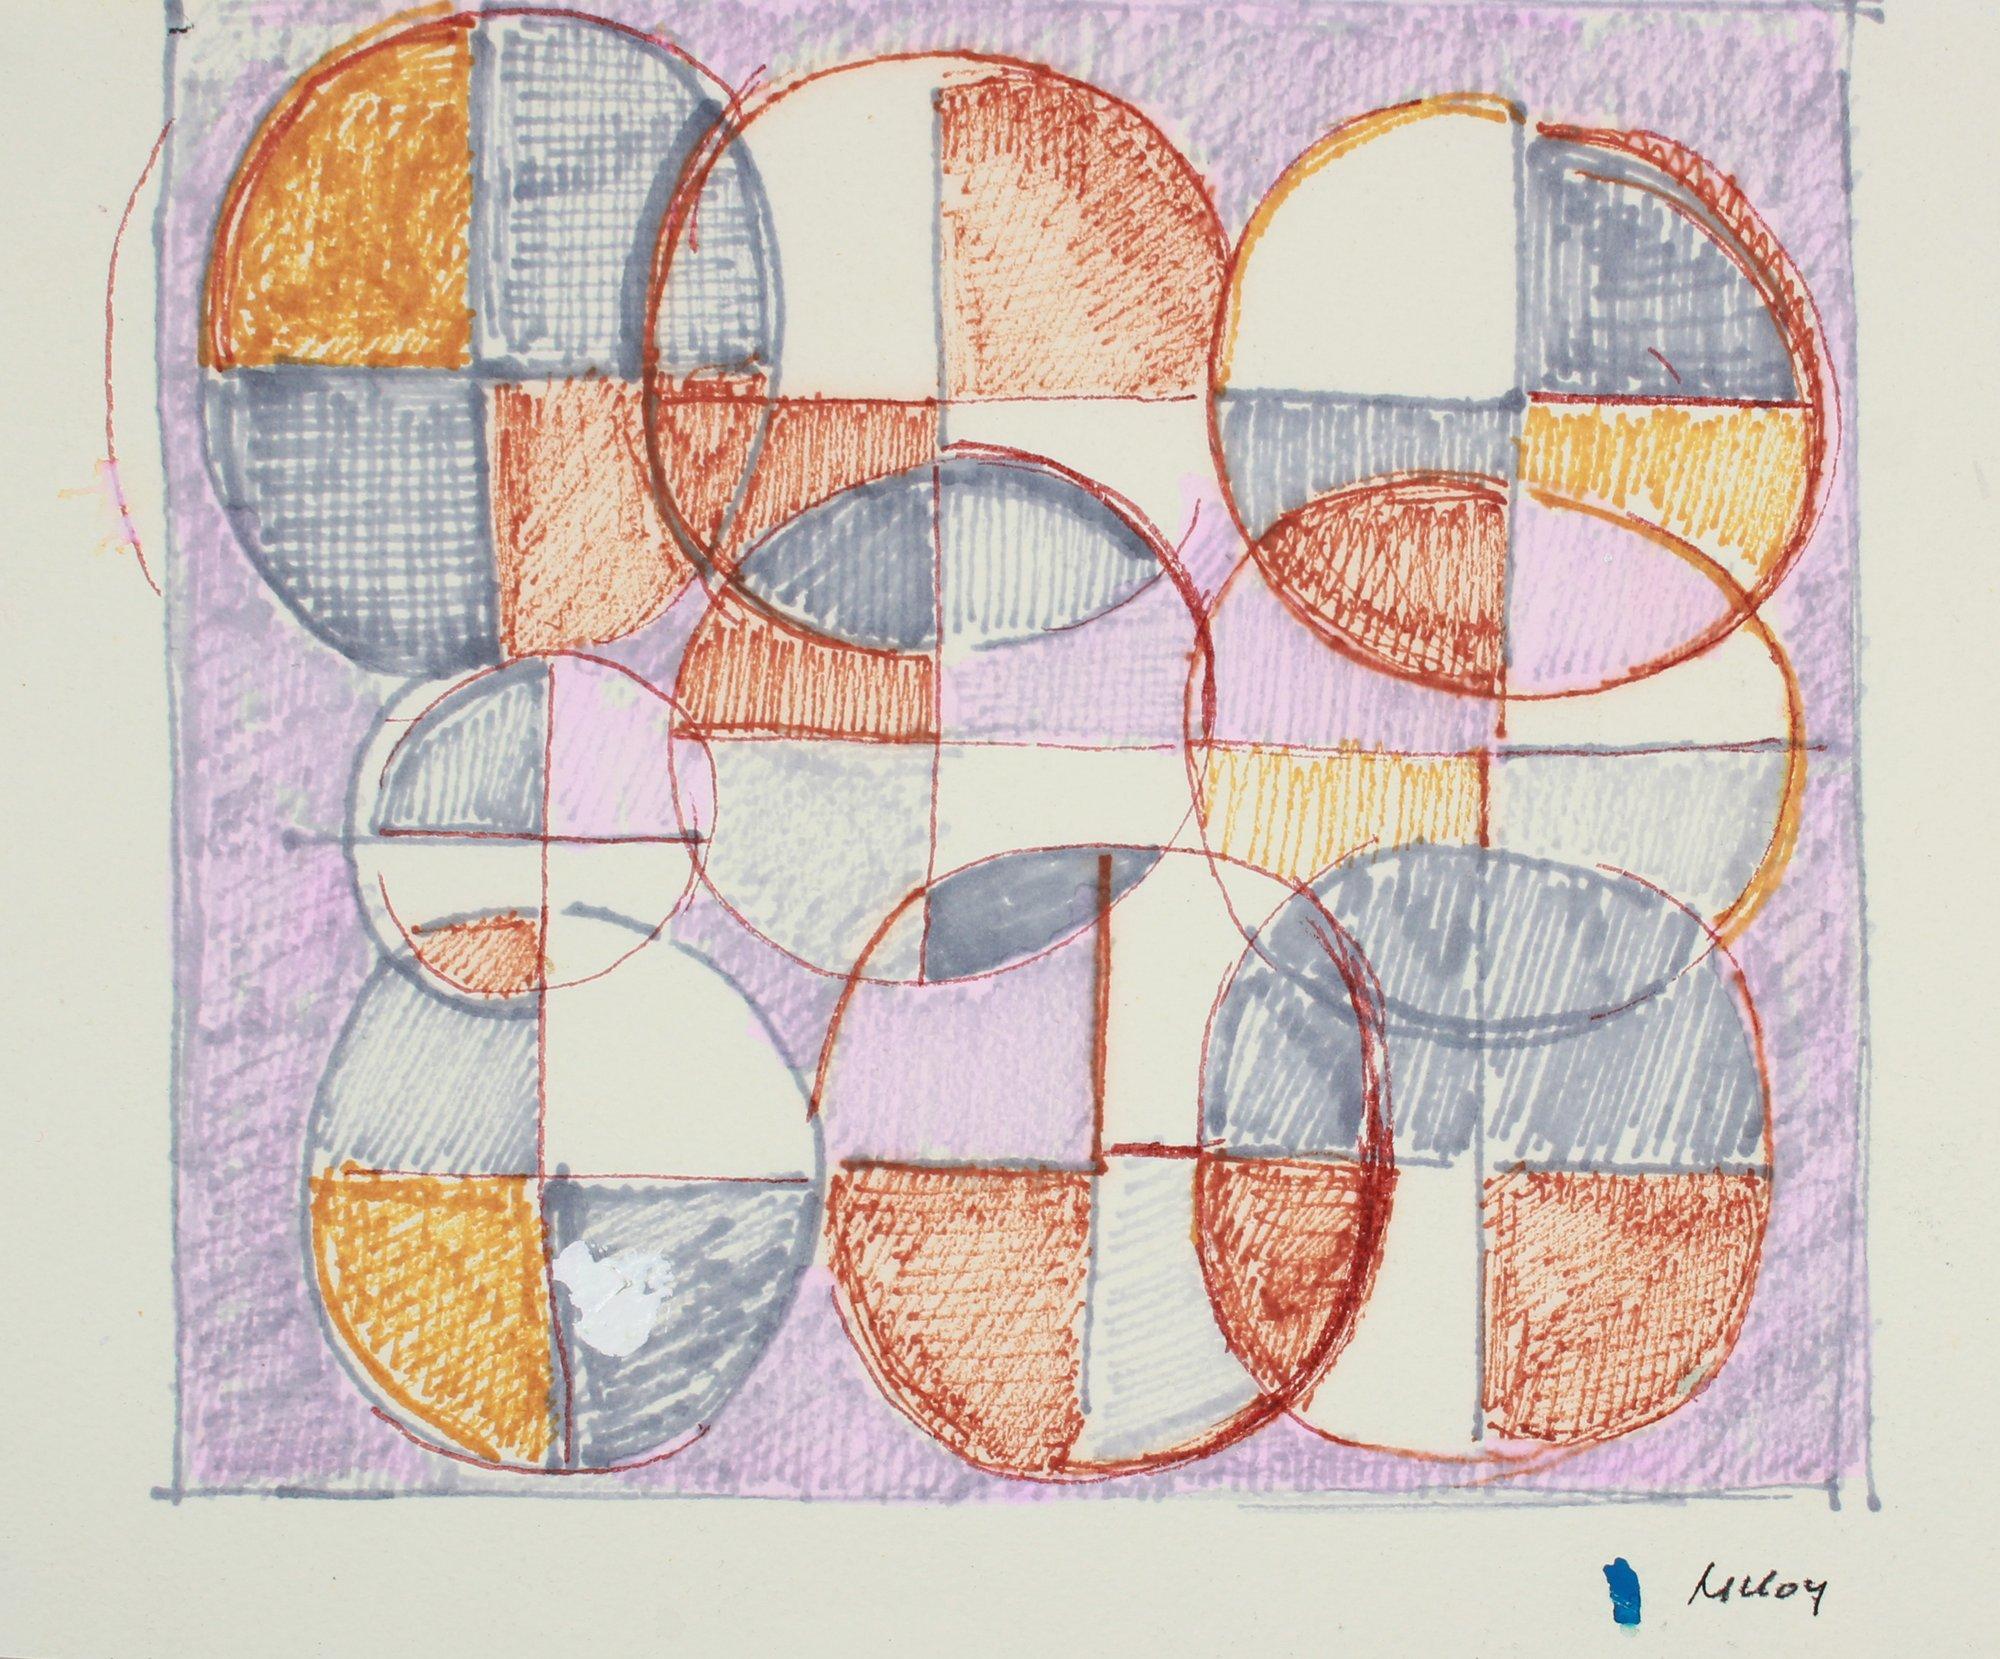 Geometric Design in Burnt Orange and Purple Mid 20th Century Drawing